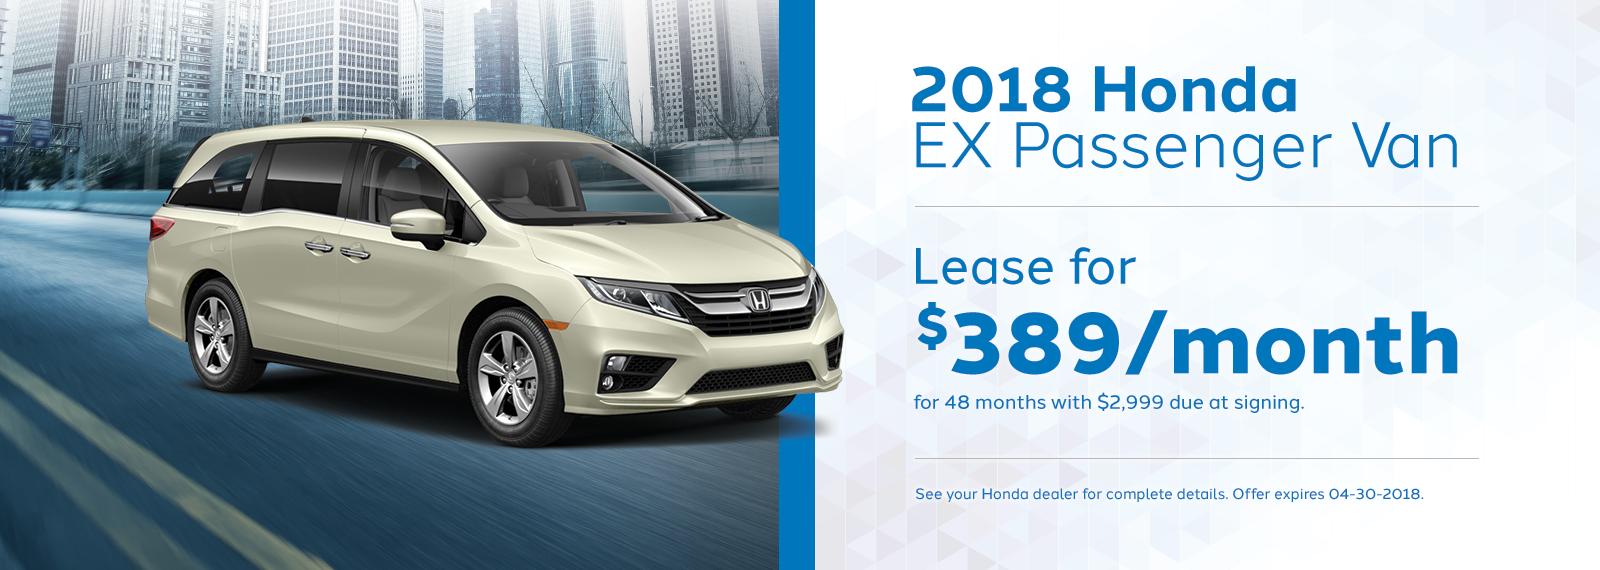 Odyssey ex April Offer Genthe Honda